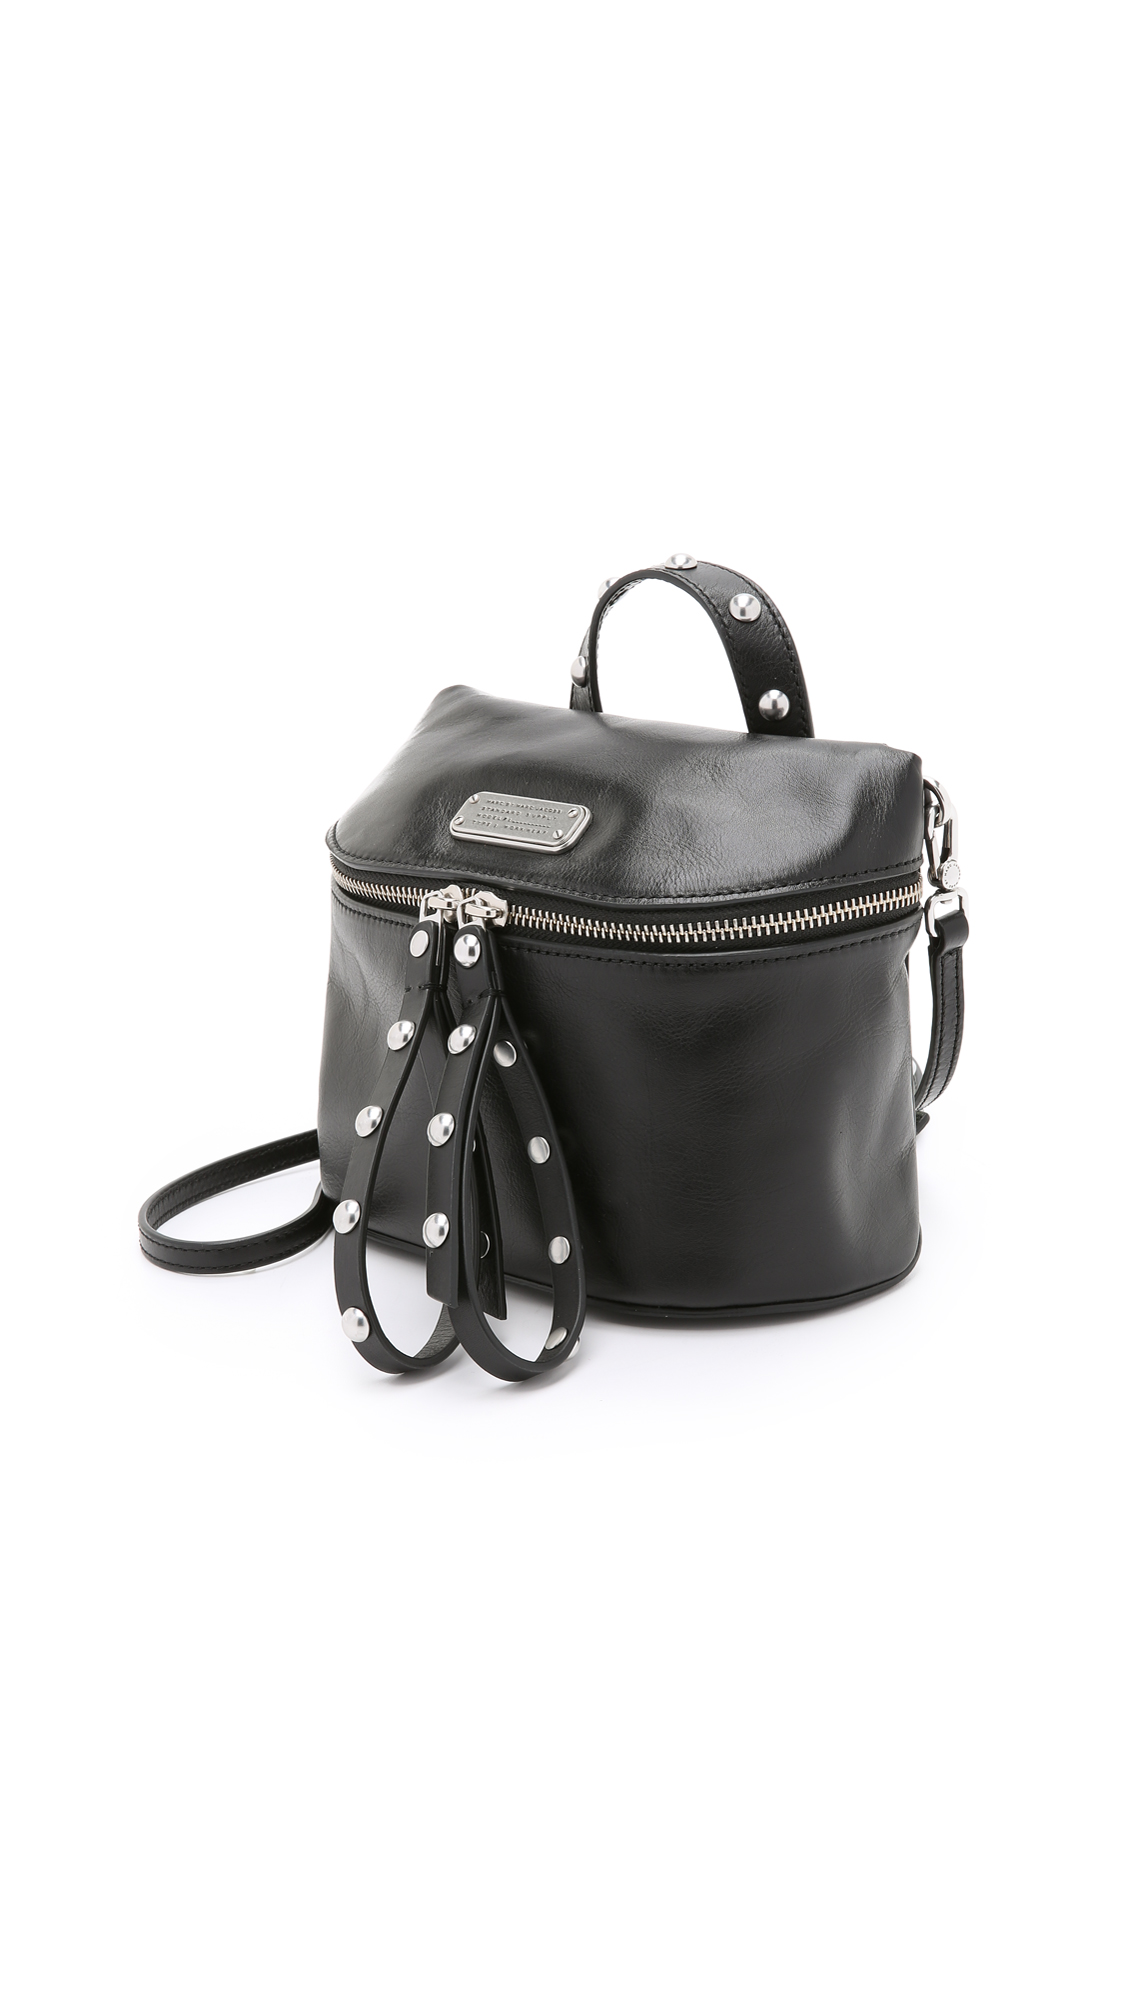 7c4d238fae94 Marc by Marc Jacobs Rivet Canteen Cross Body Bag